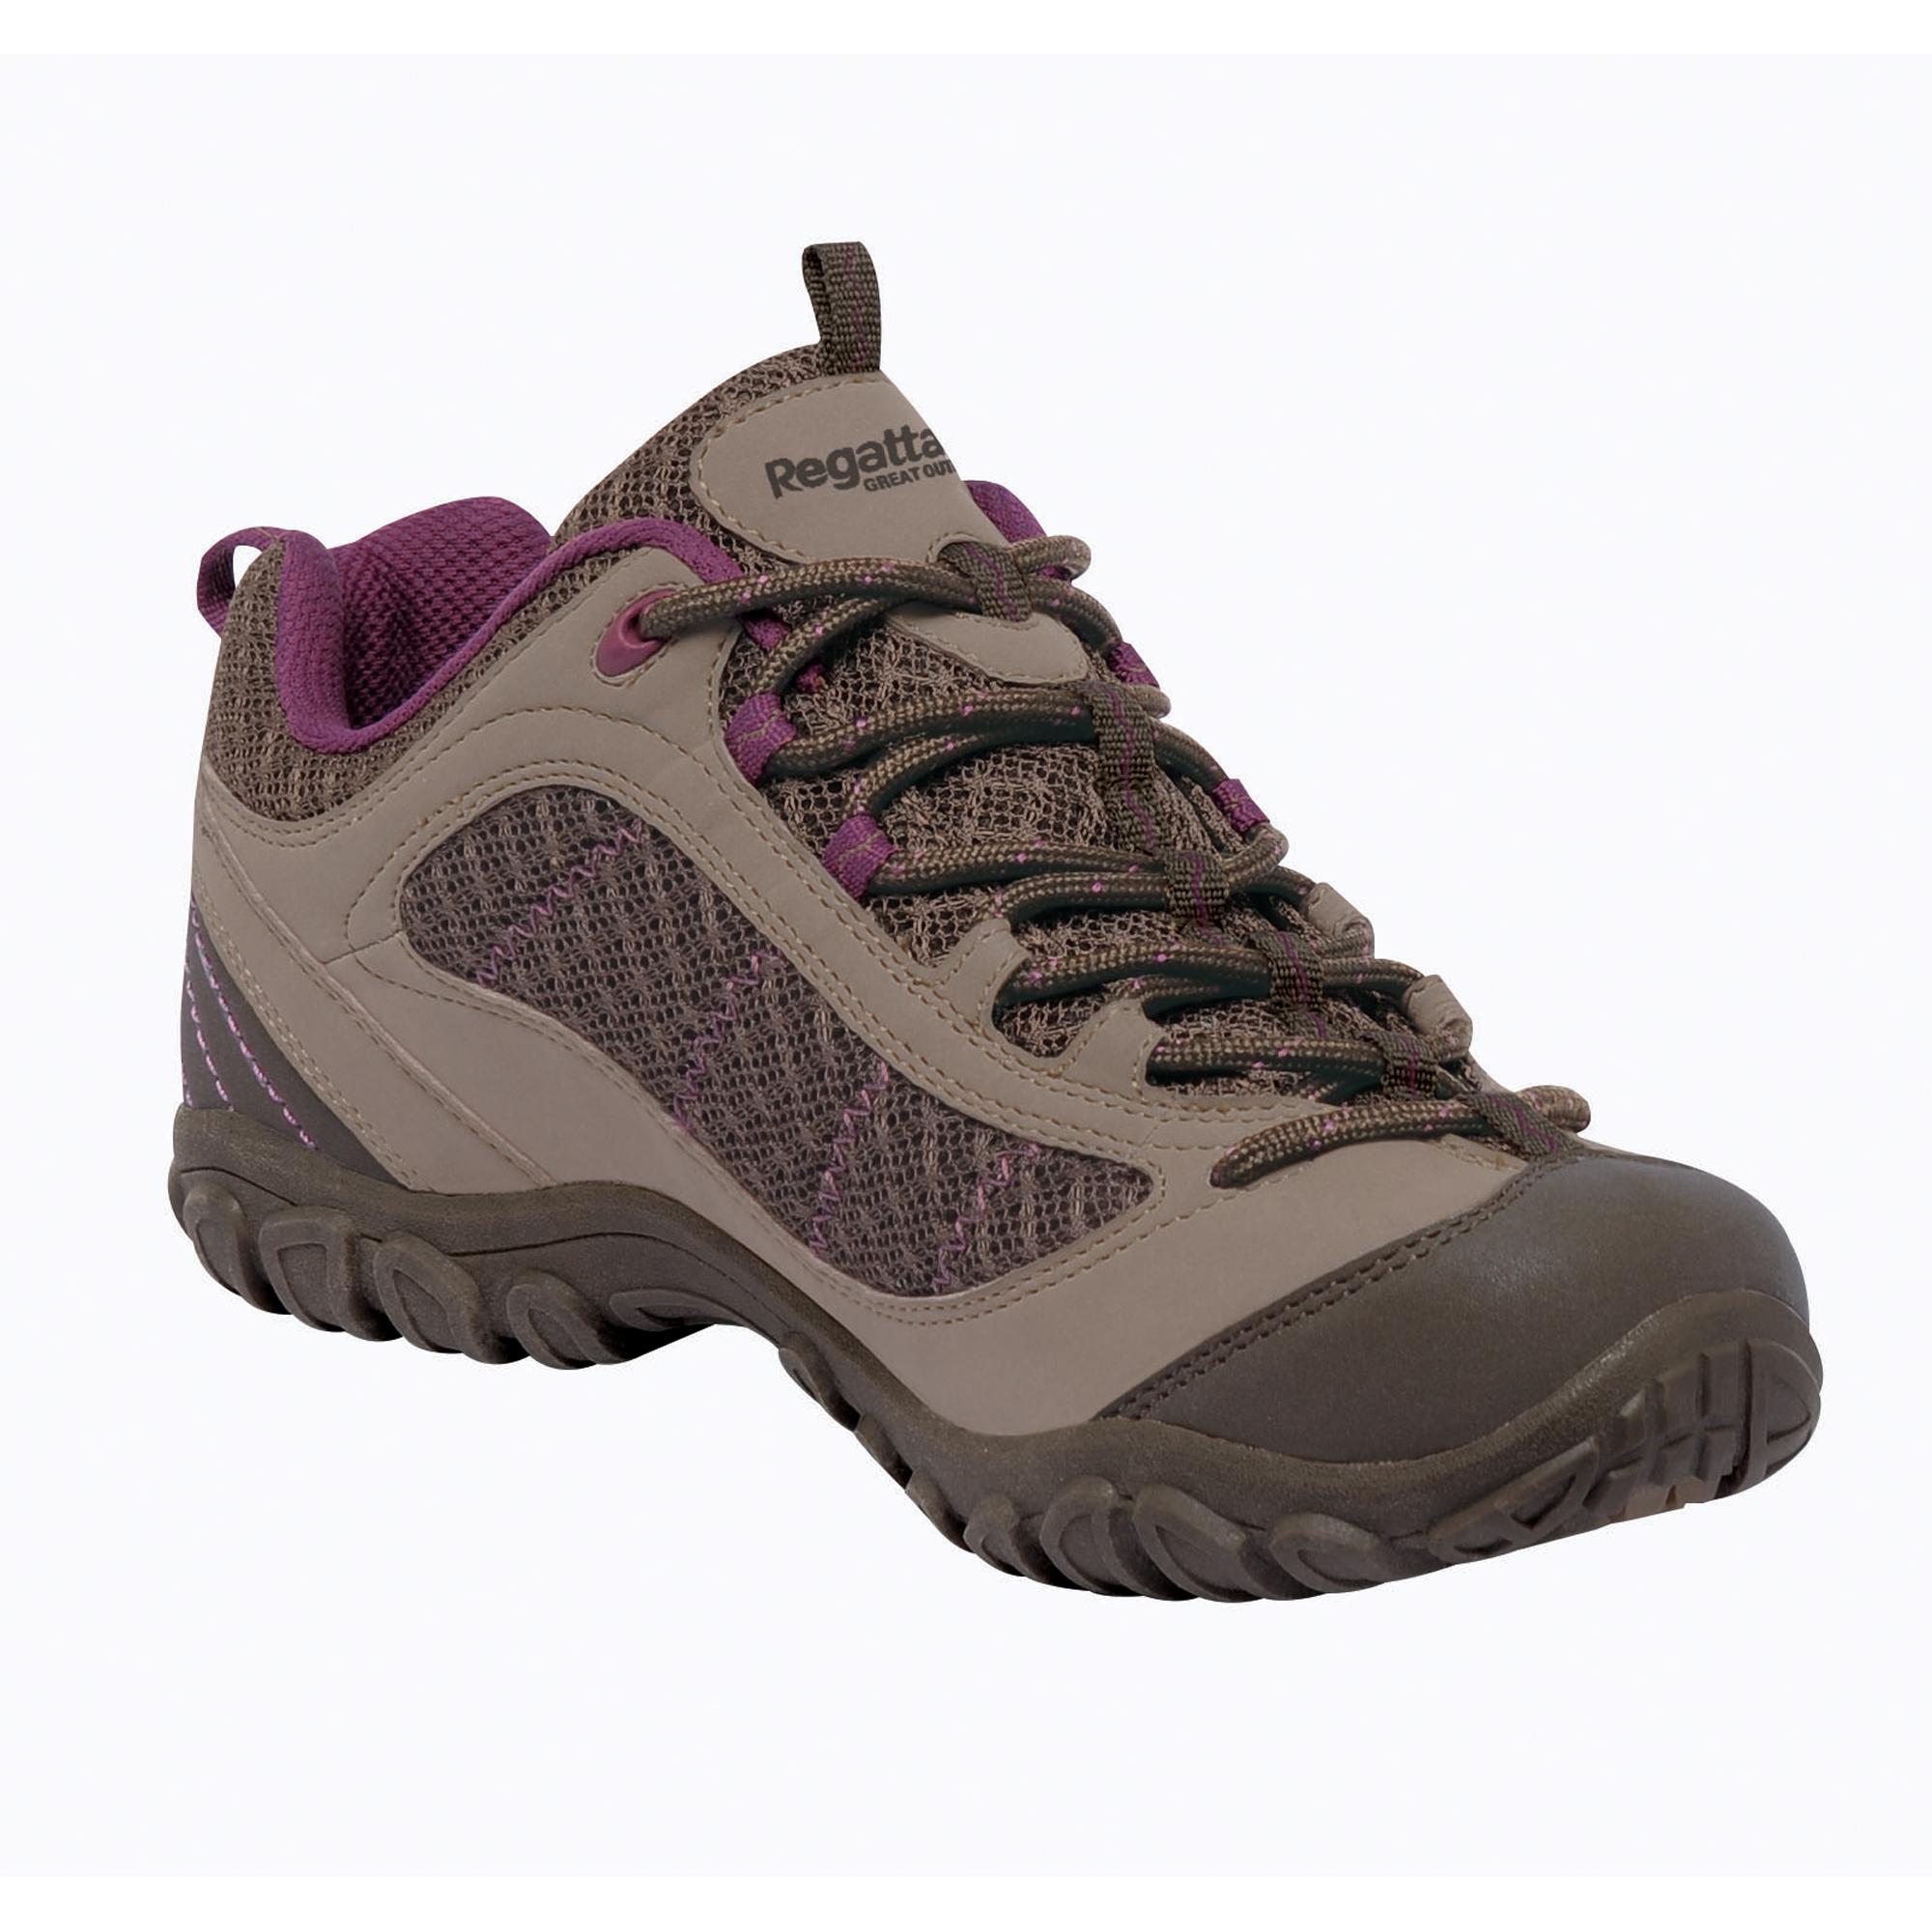 Regatta Lady Edgepoint Trail Shoe